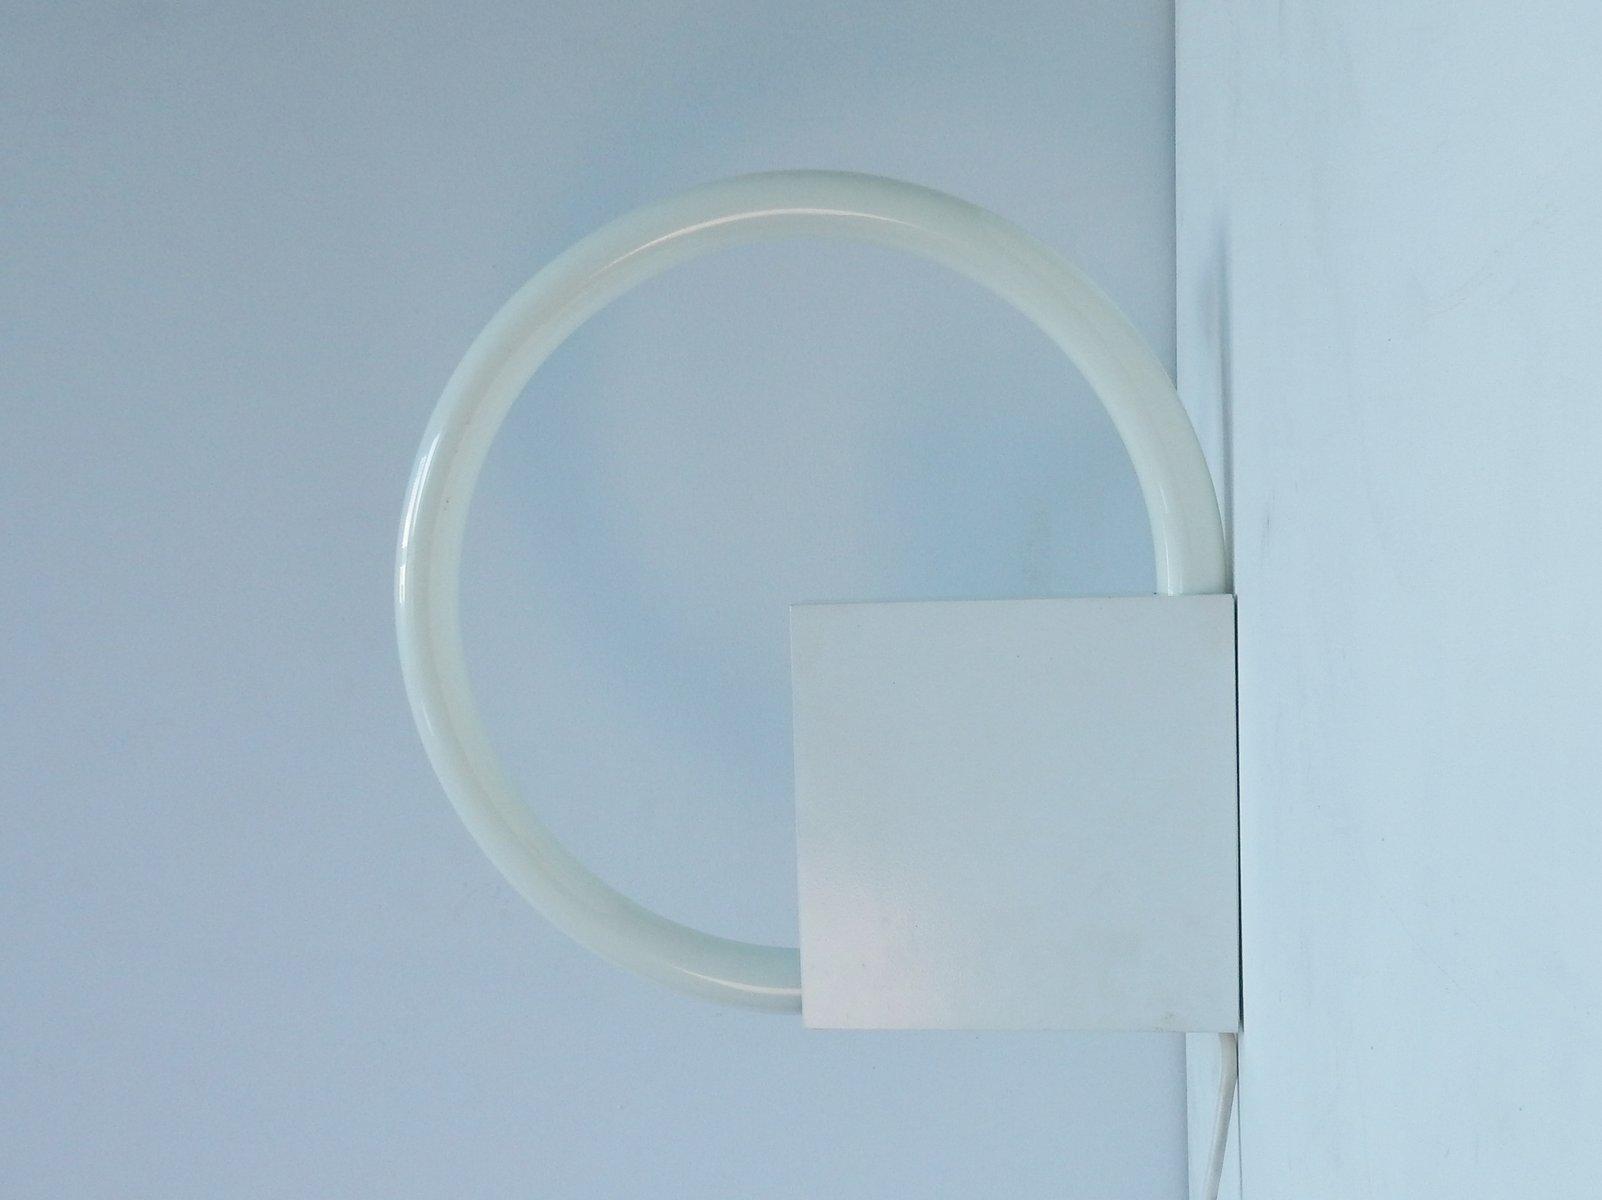 TC6 Circle Lampe von Aldo van den Nieuwelaar für Nila, 1968